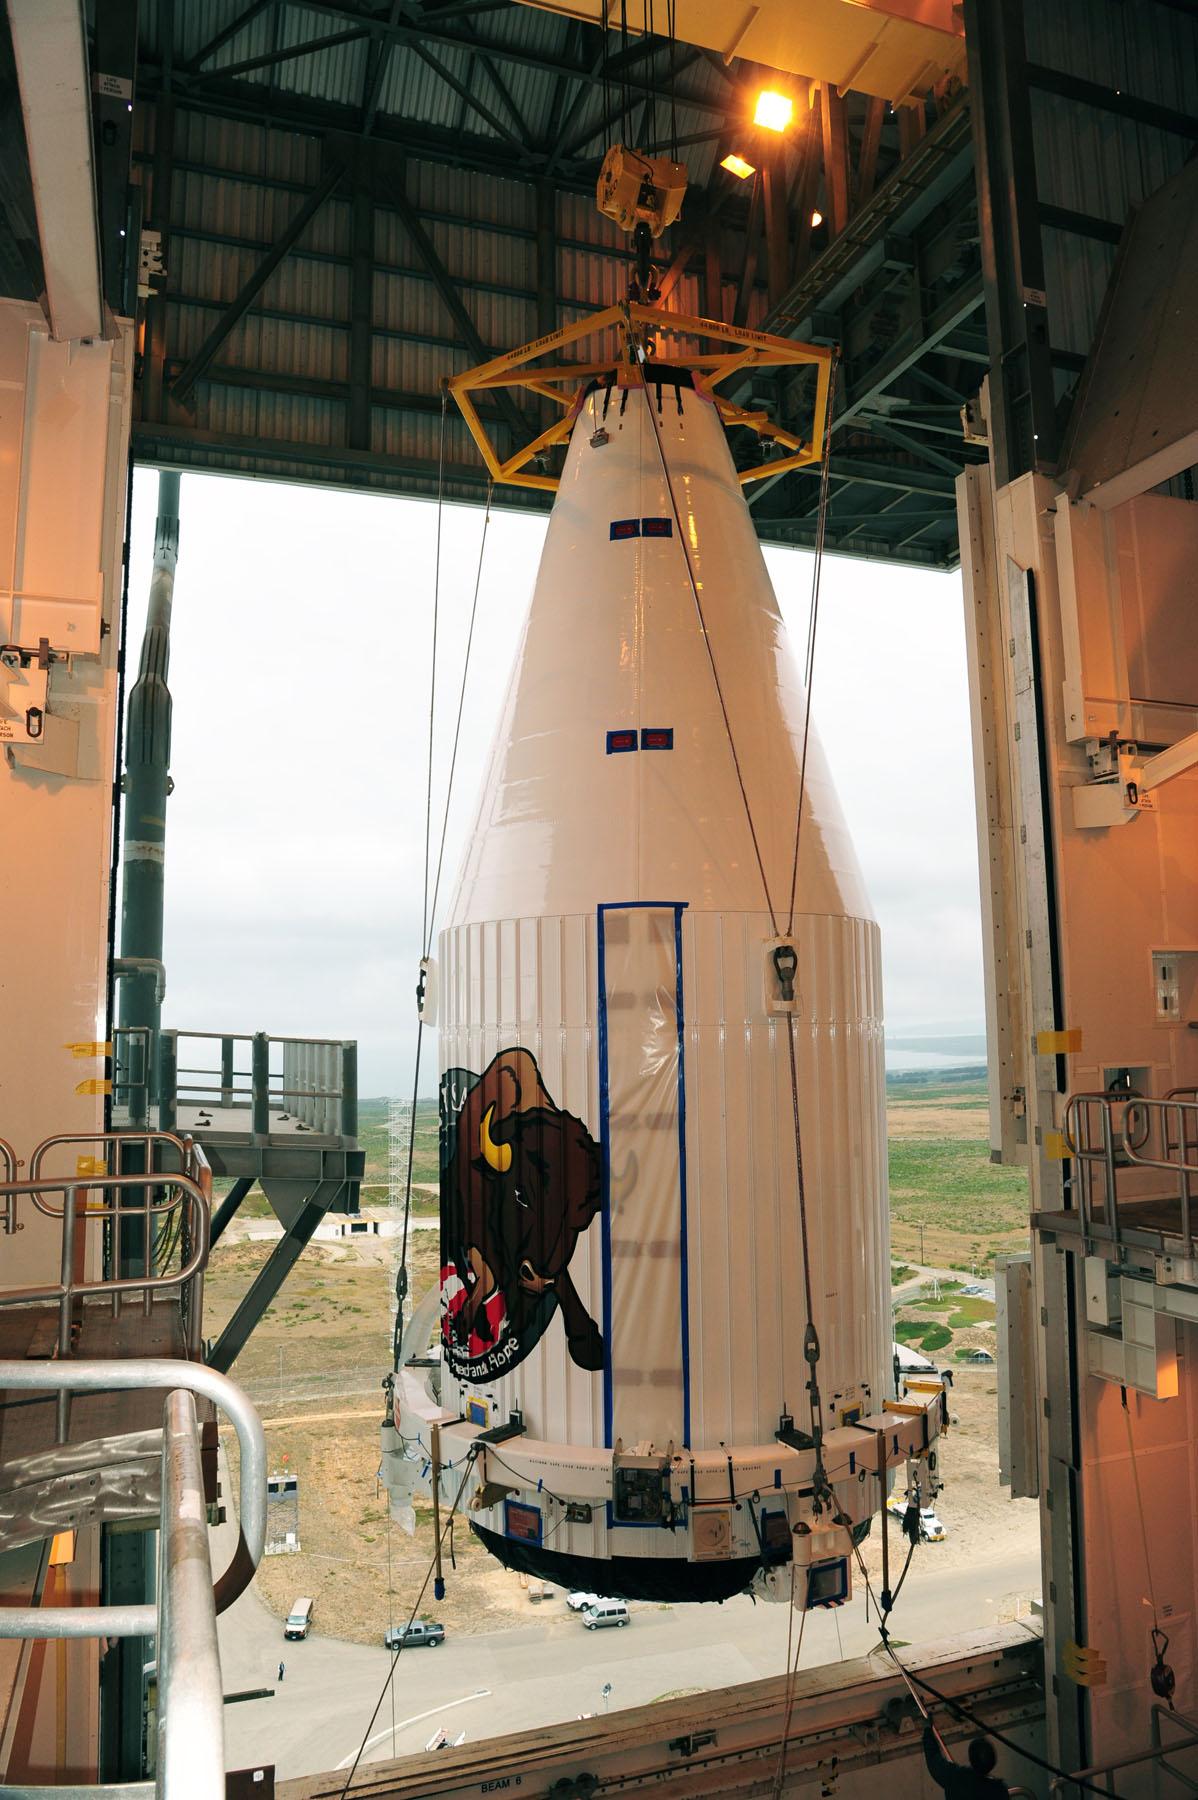 NROL-36 Spy Satellite Mated to Rocket